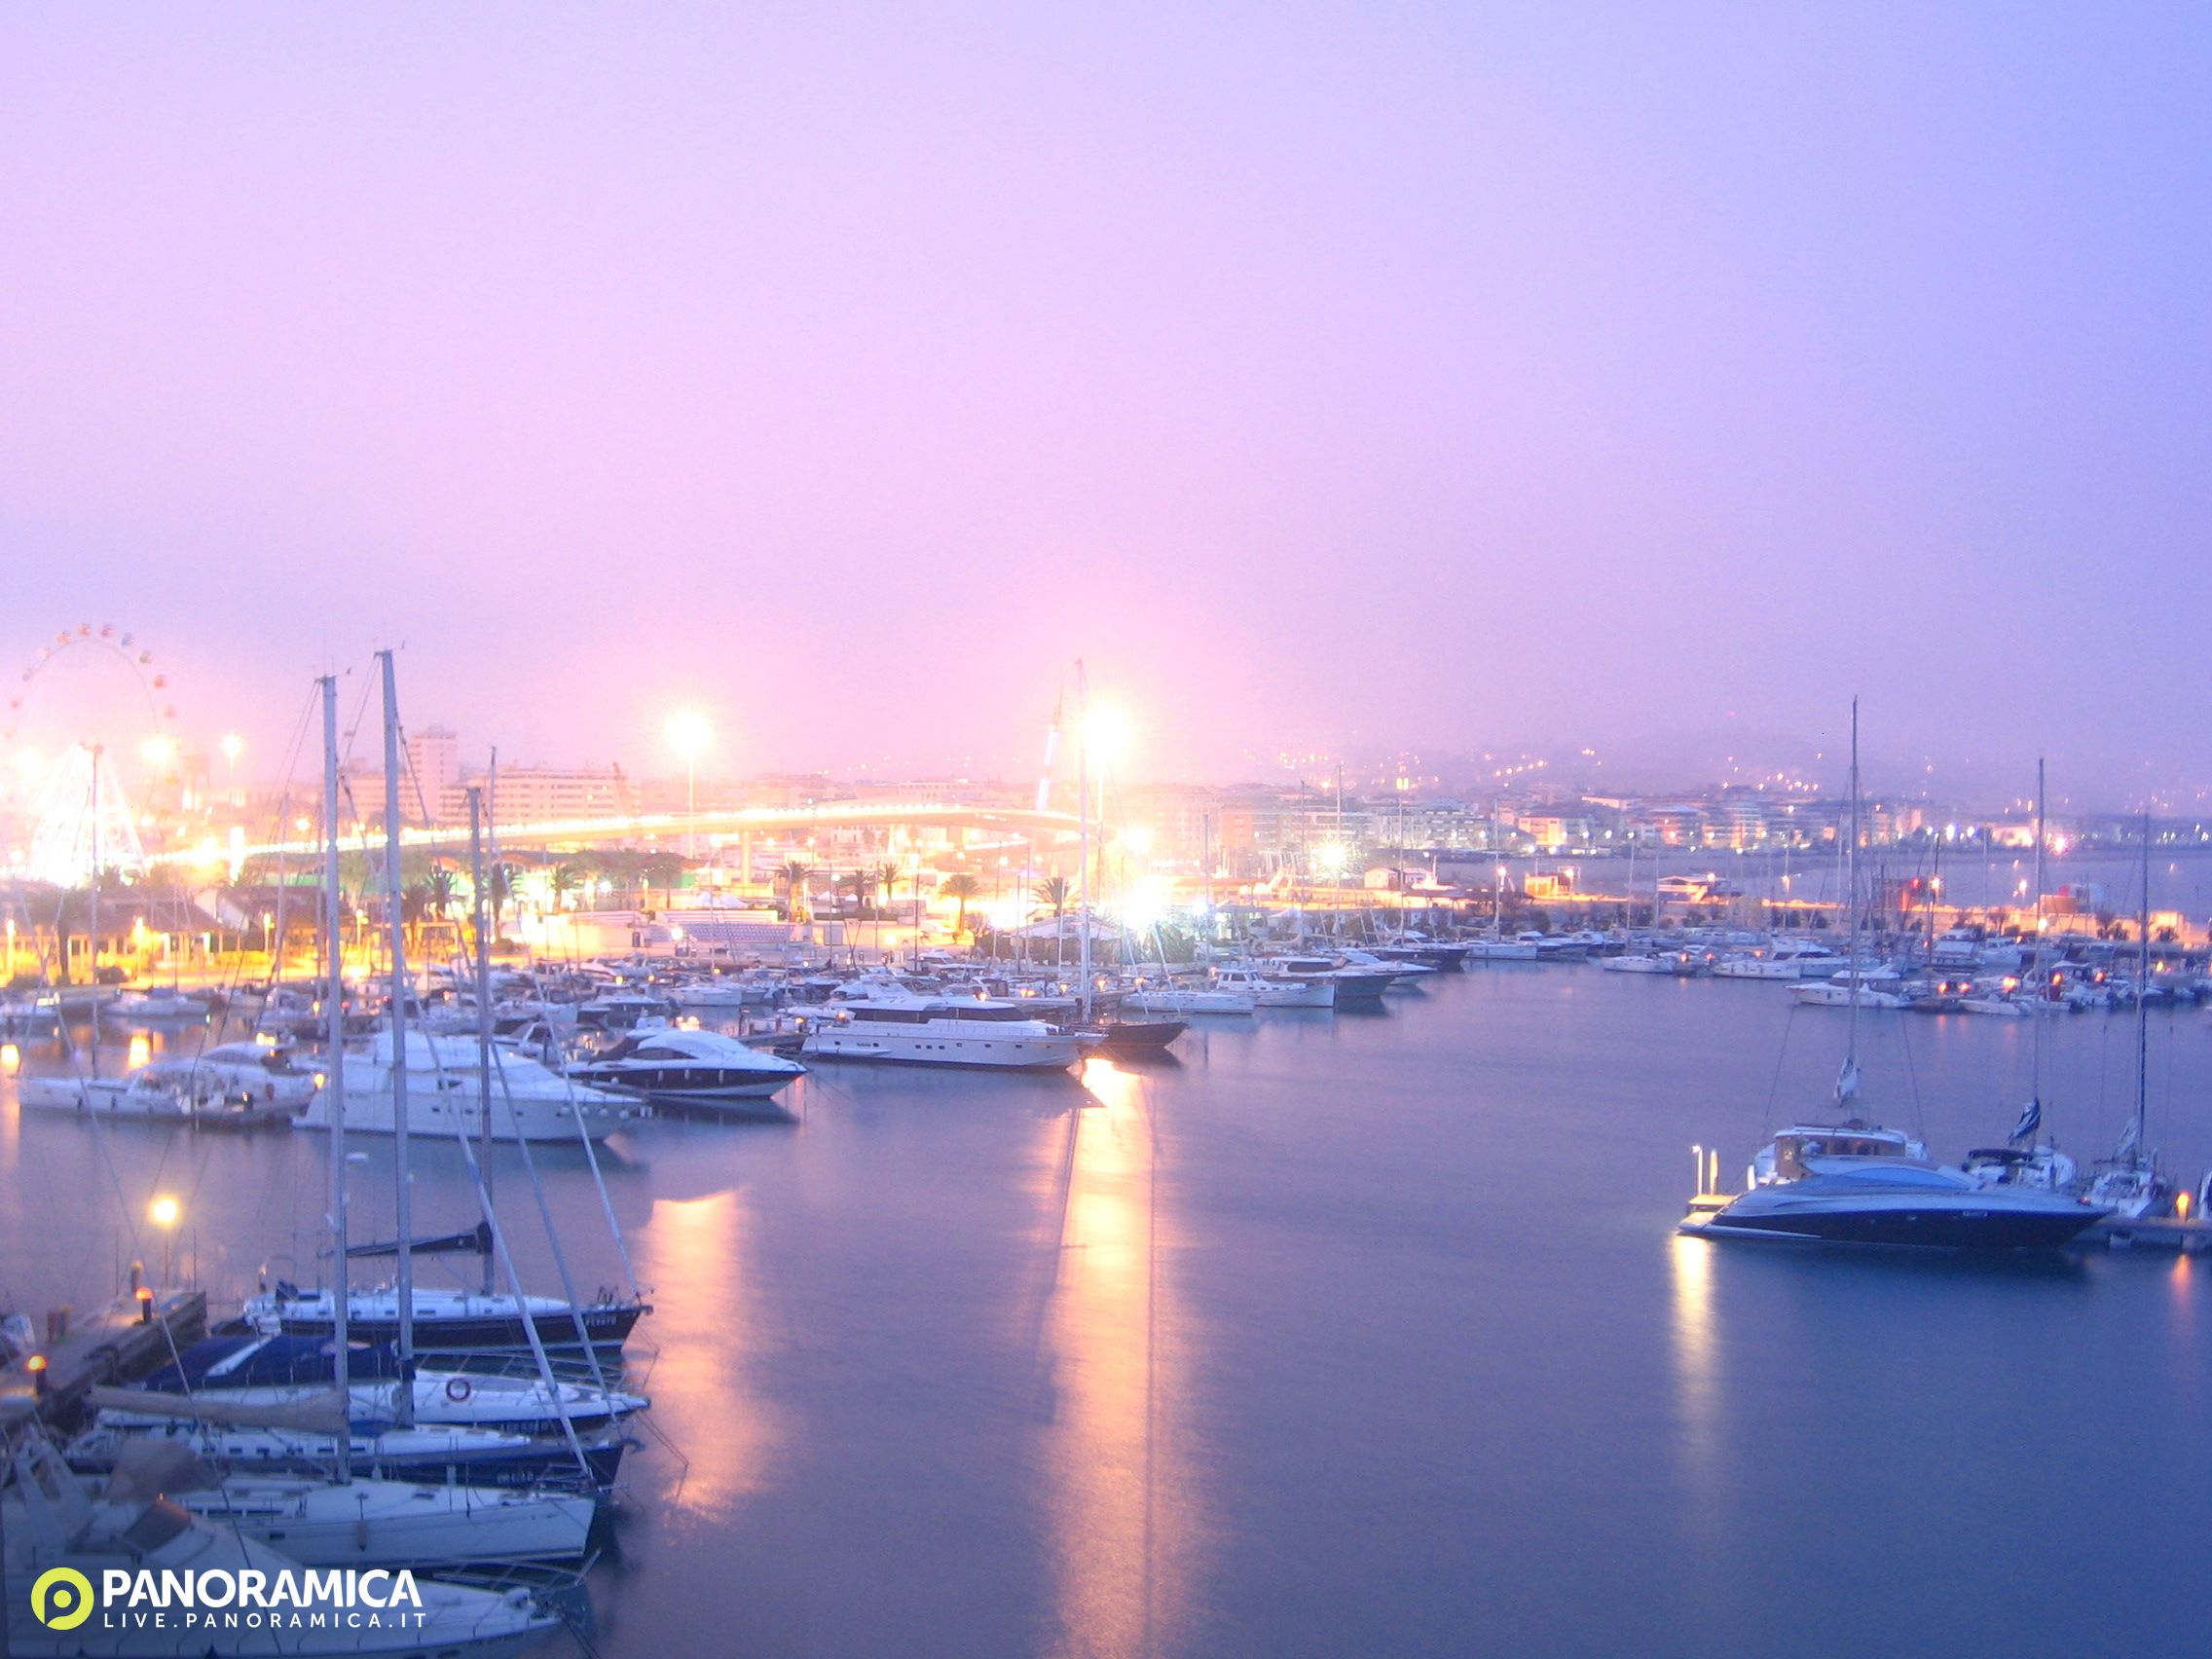 Pescara Camera Live : Pescara live panoramica.it: foto del 28 01 2018 07:00